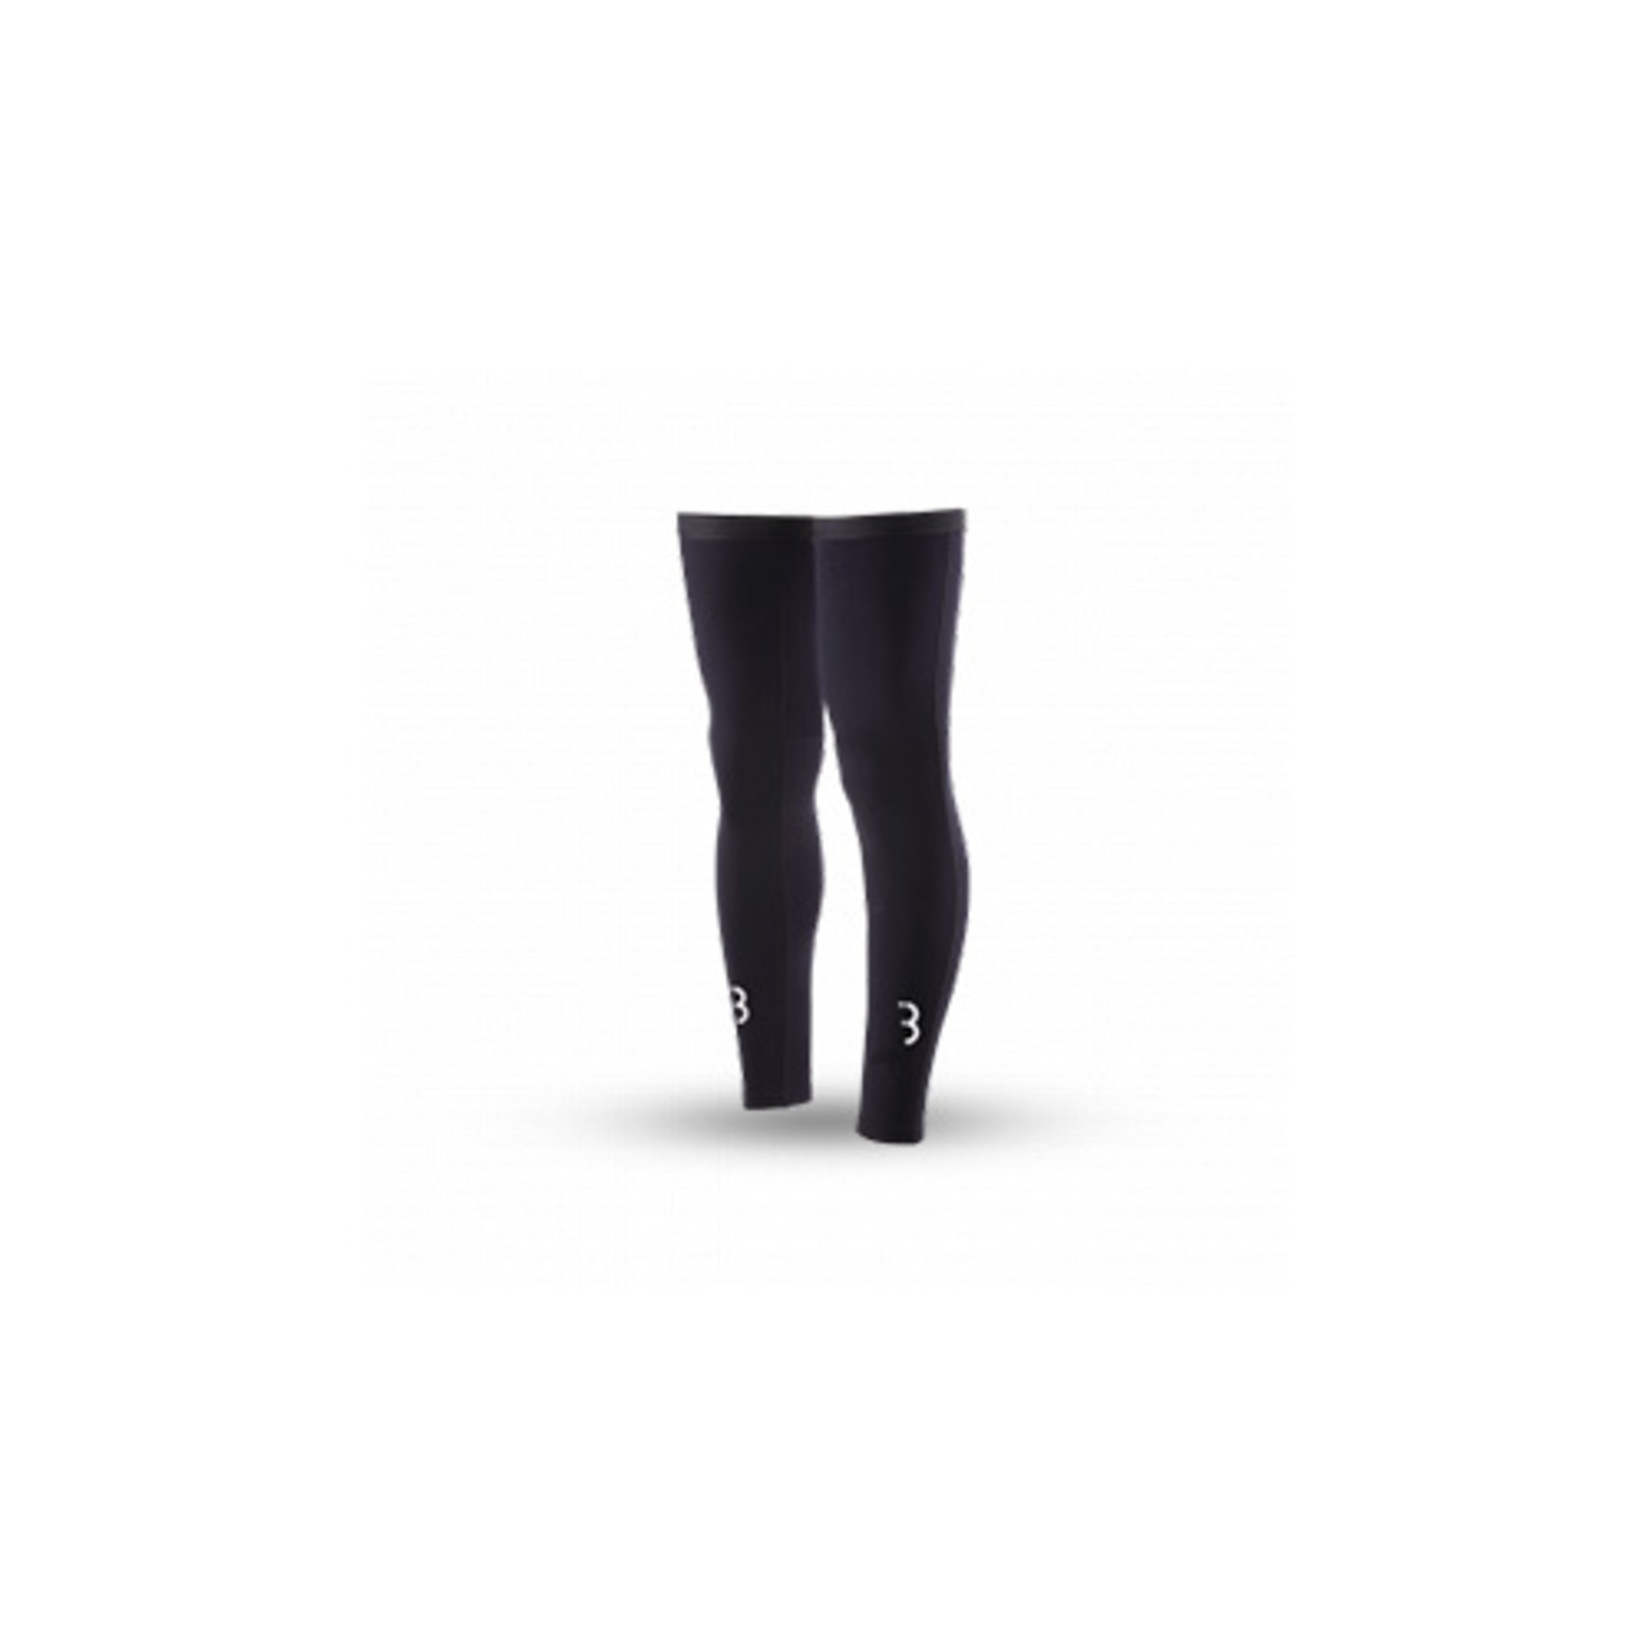 BBB BBB BBW-91 LEG WARMERS